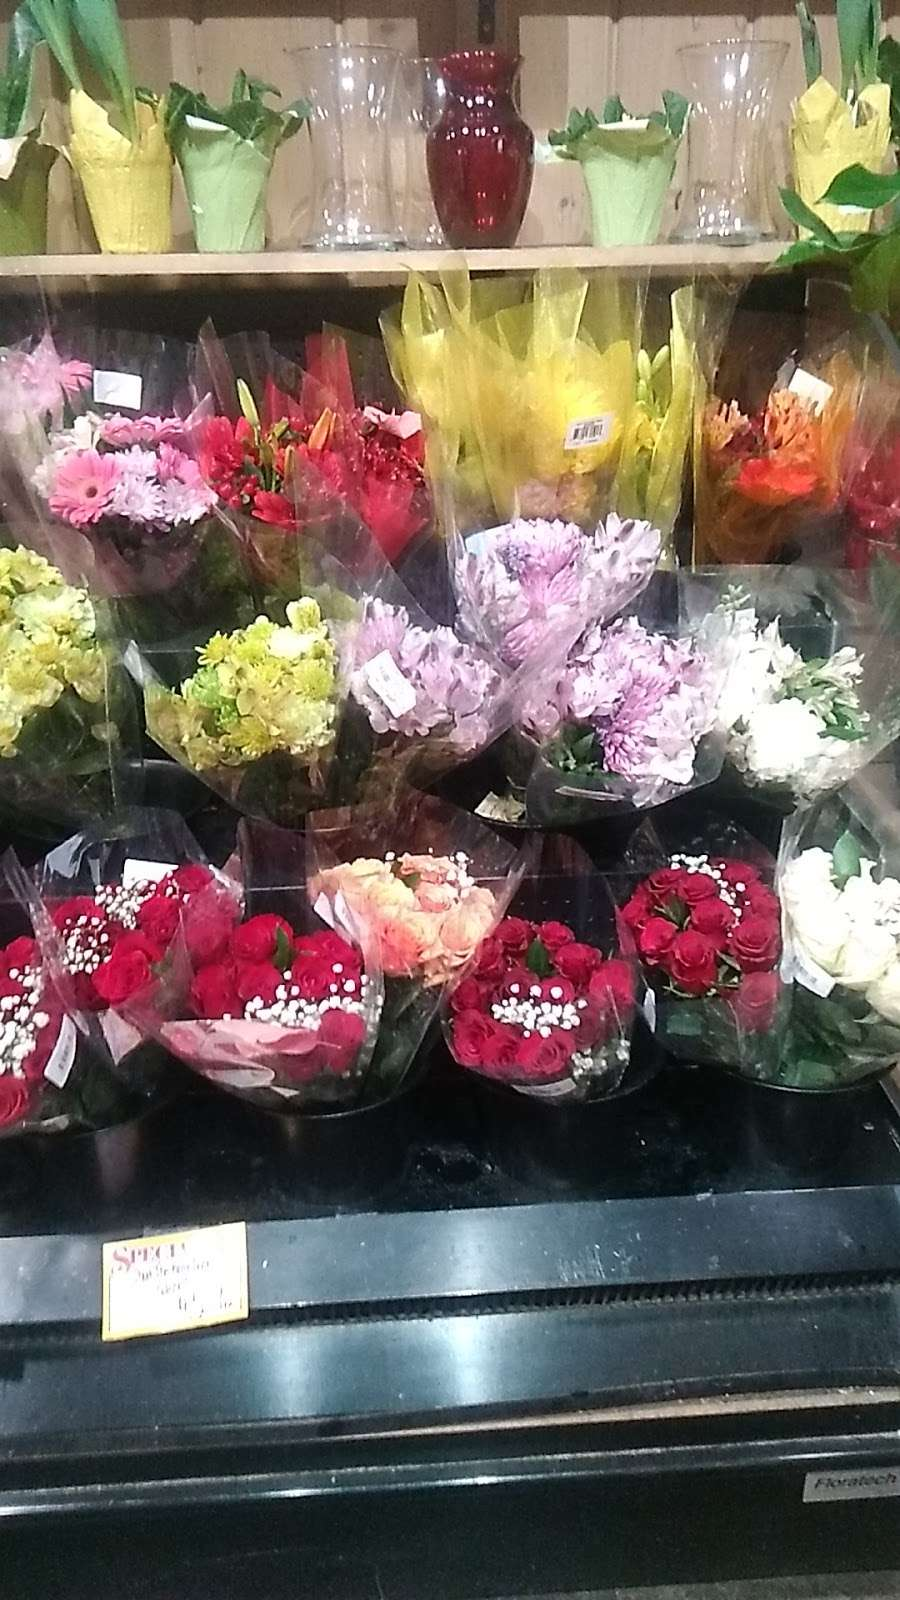 Kobacker Market Inc. - store  | Photo 7 of 9 | Address: 570 N Main St, Brewster, NY 10509, USA | Phone: (845) 279-3515